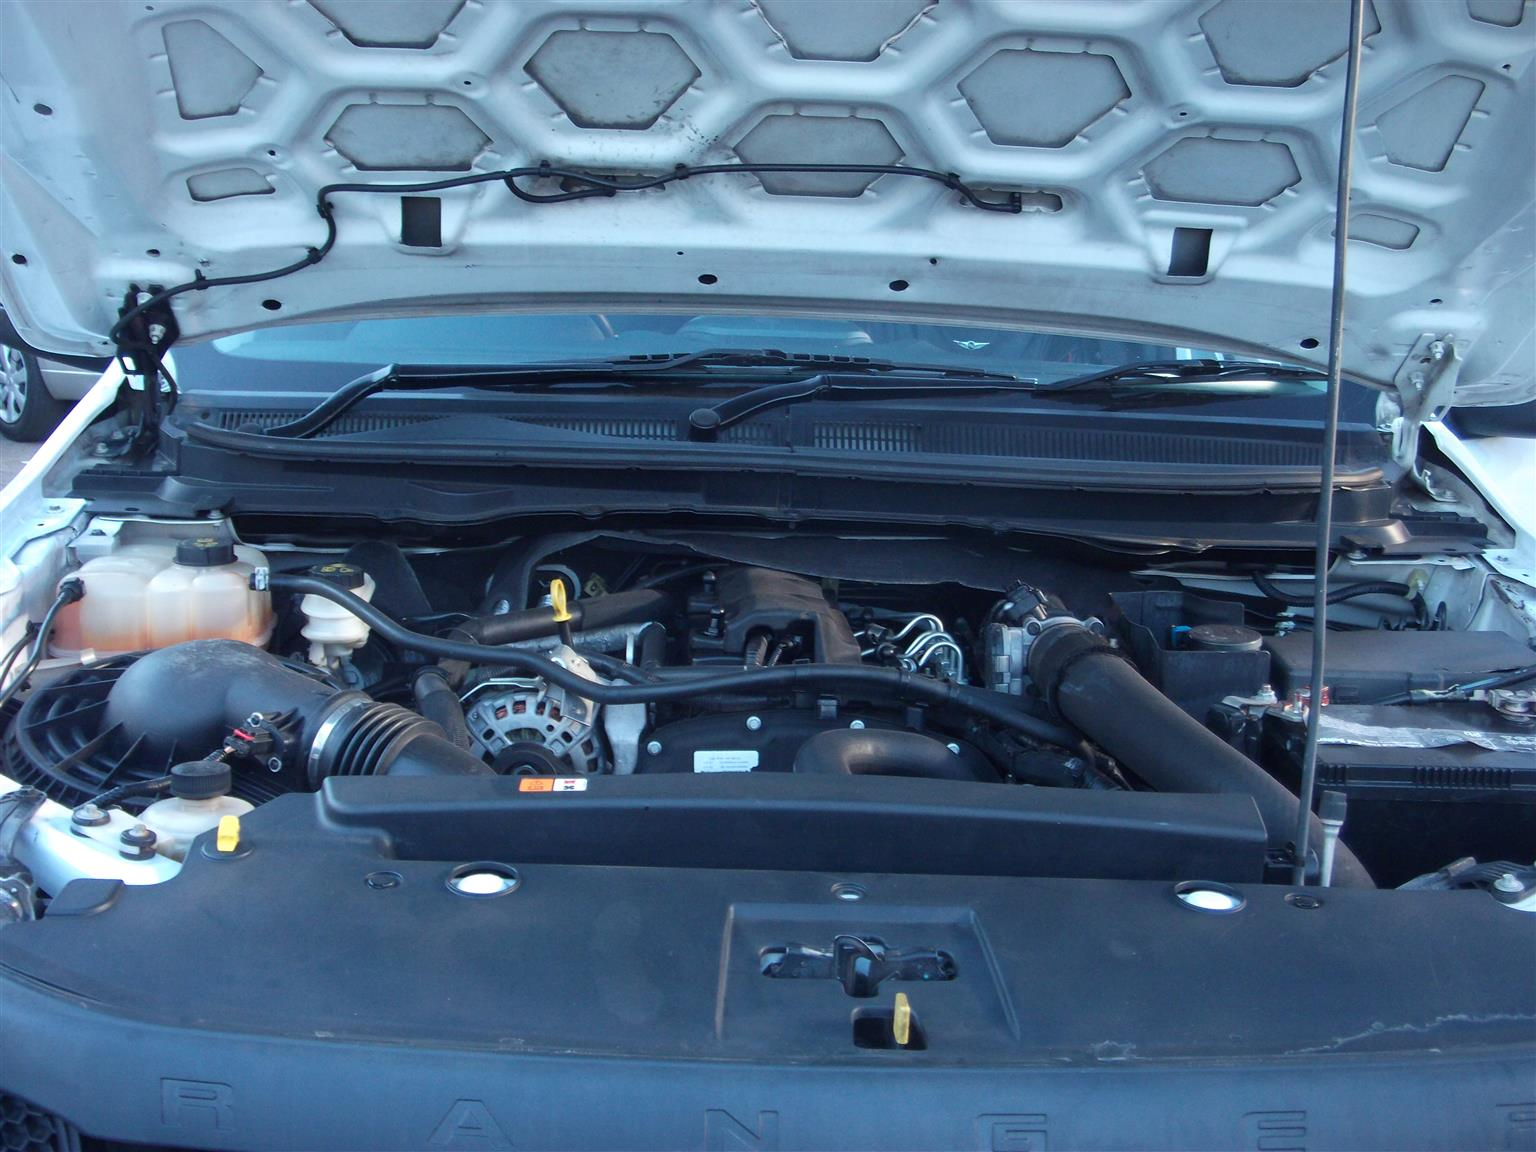 2014 Ford Ranger 2.2 double cab Hi Rider XLS